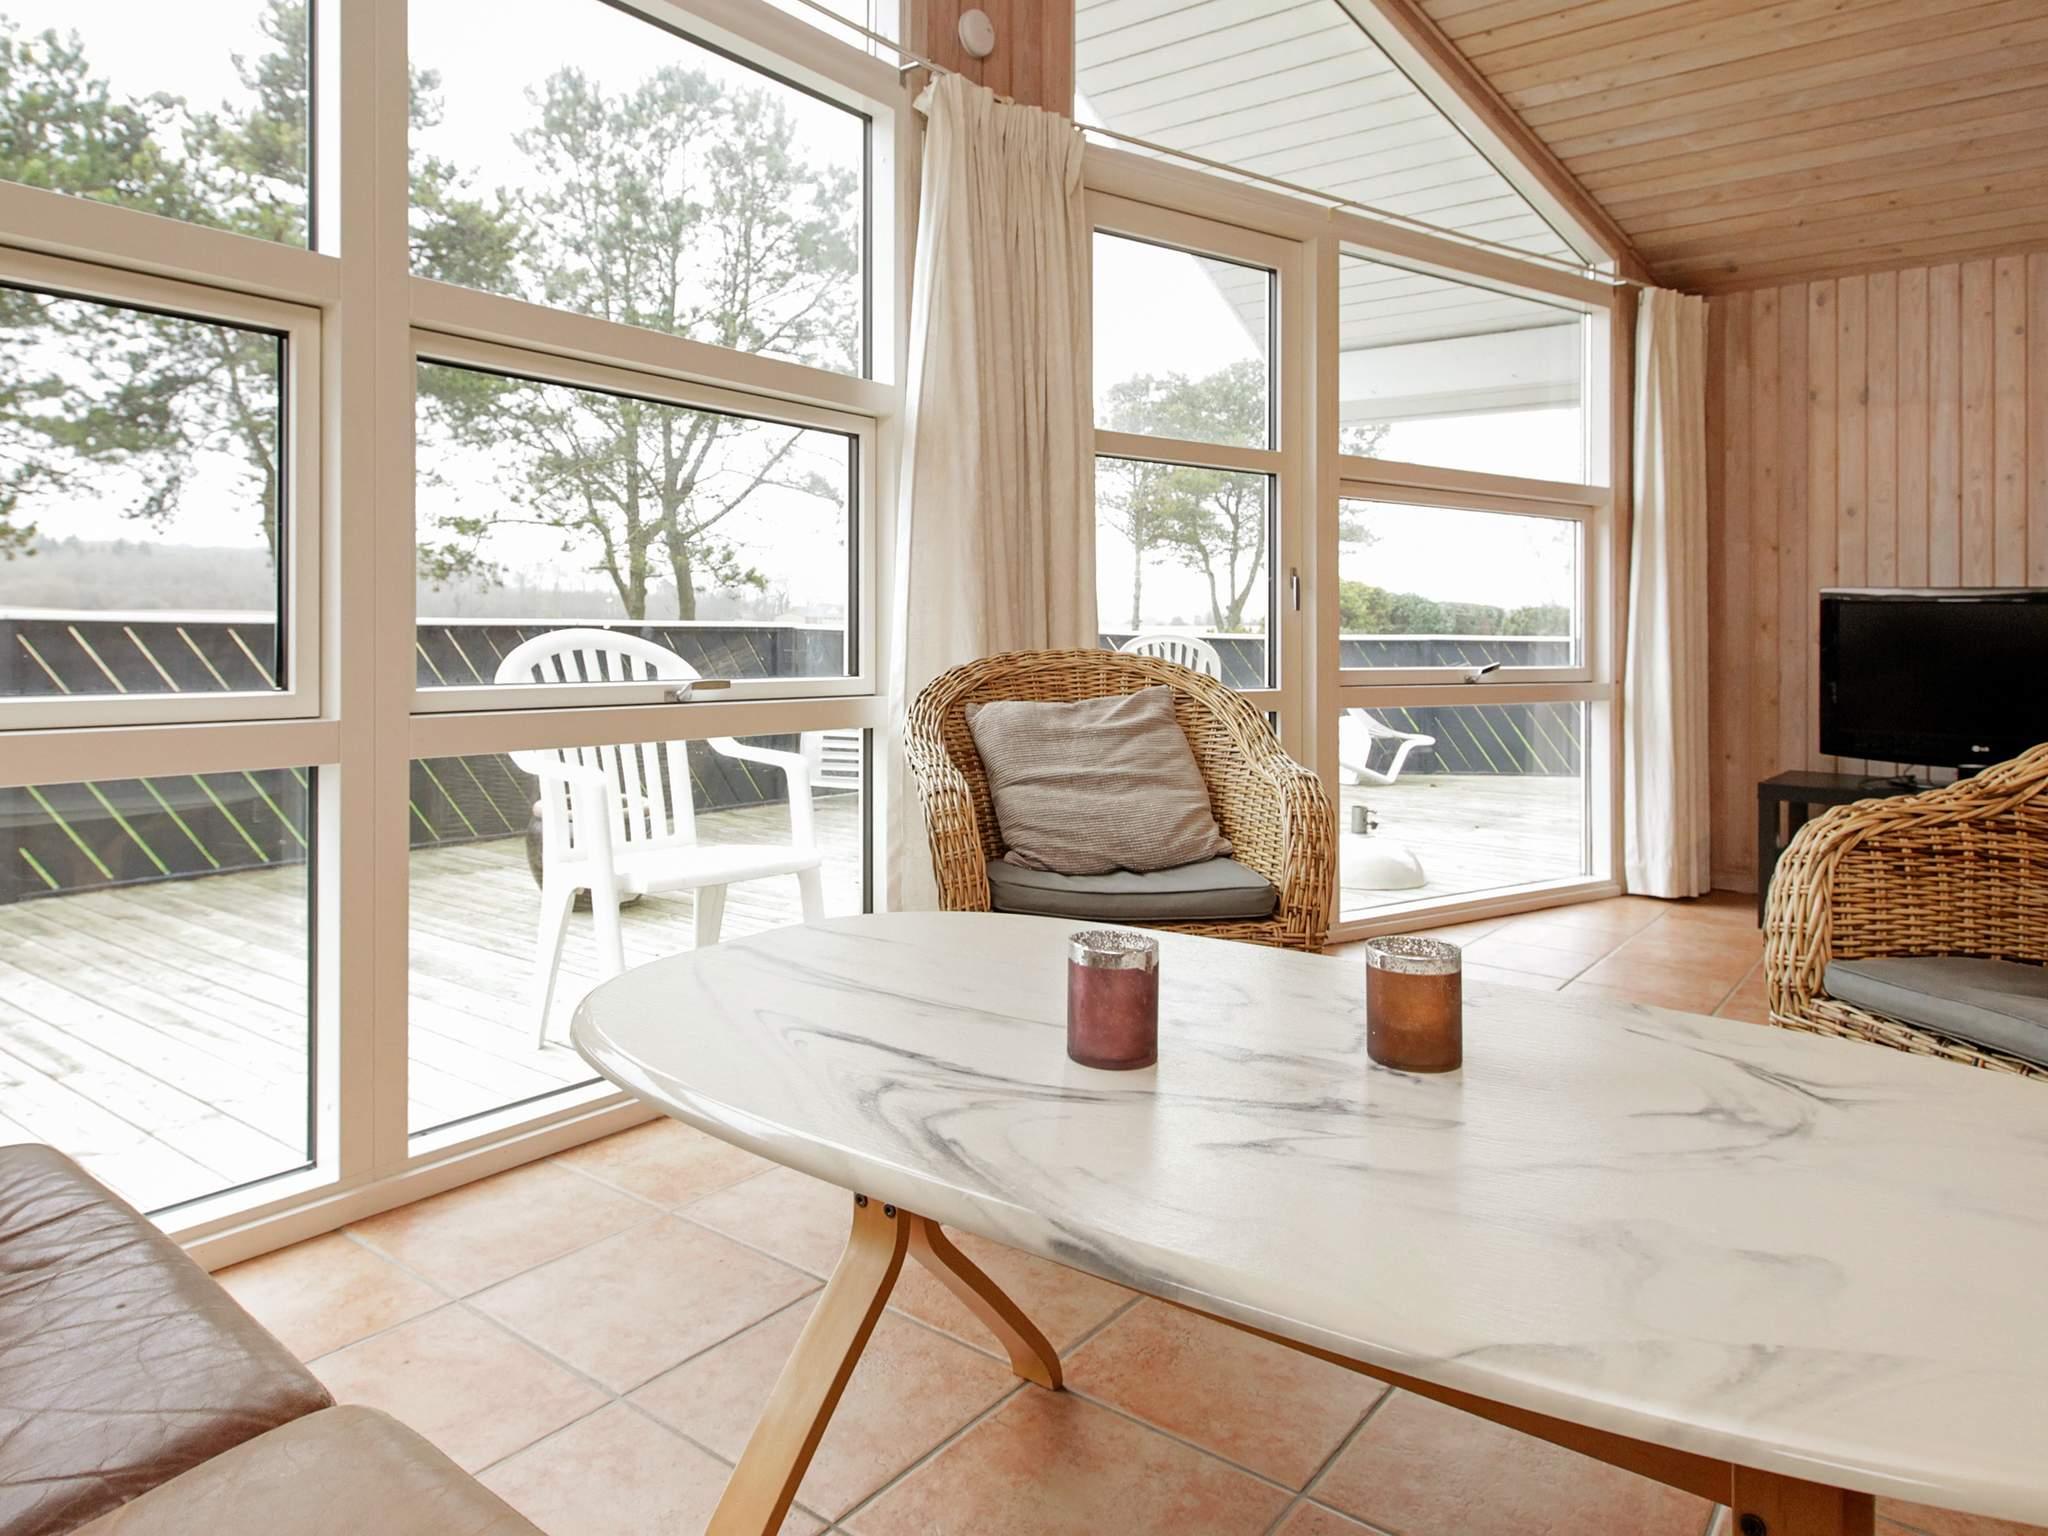 Ferienhaus Fredmosen (596960), Humble, , Langeland, Dänemark, Bild 4